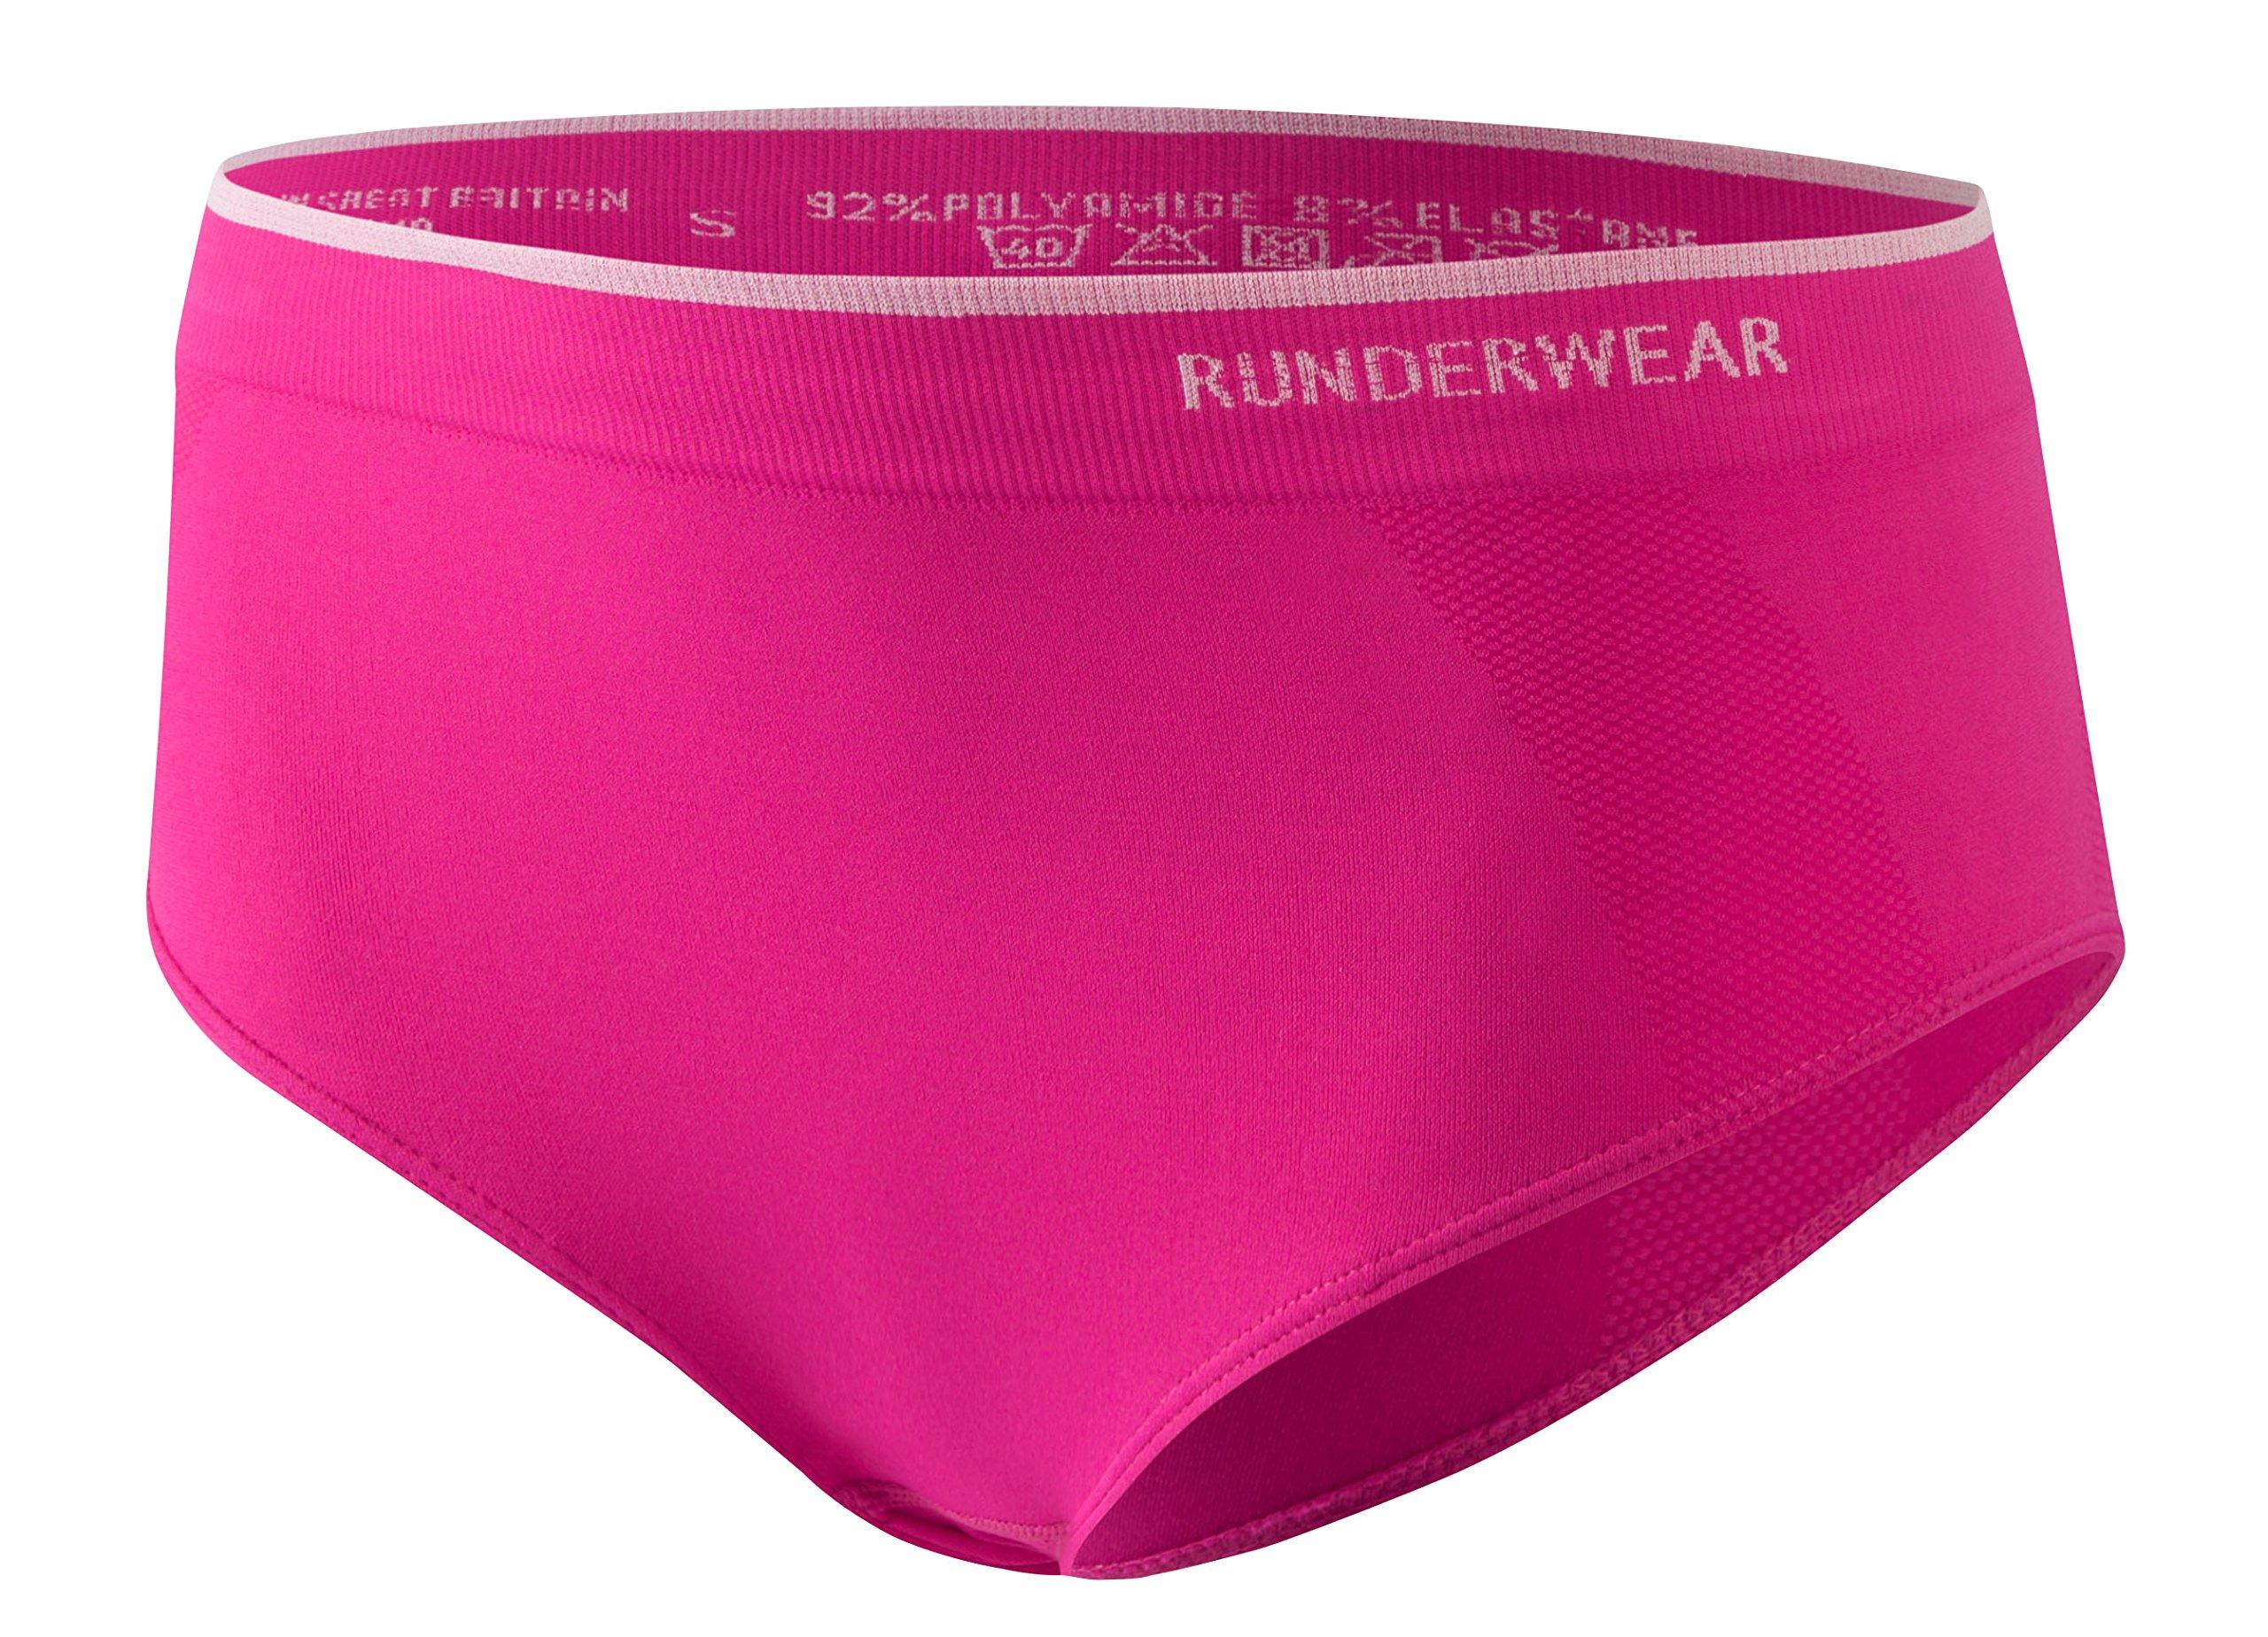 Runderwear Women's Low-Rise Seamless Hipster - Pink, Medium